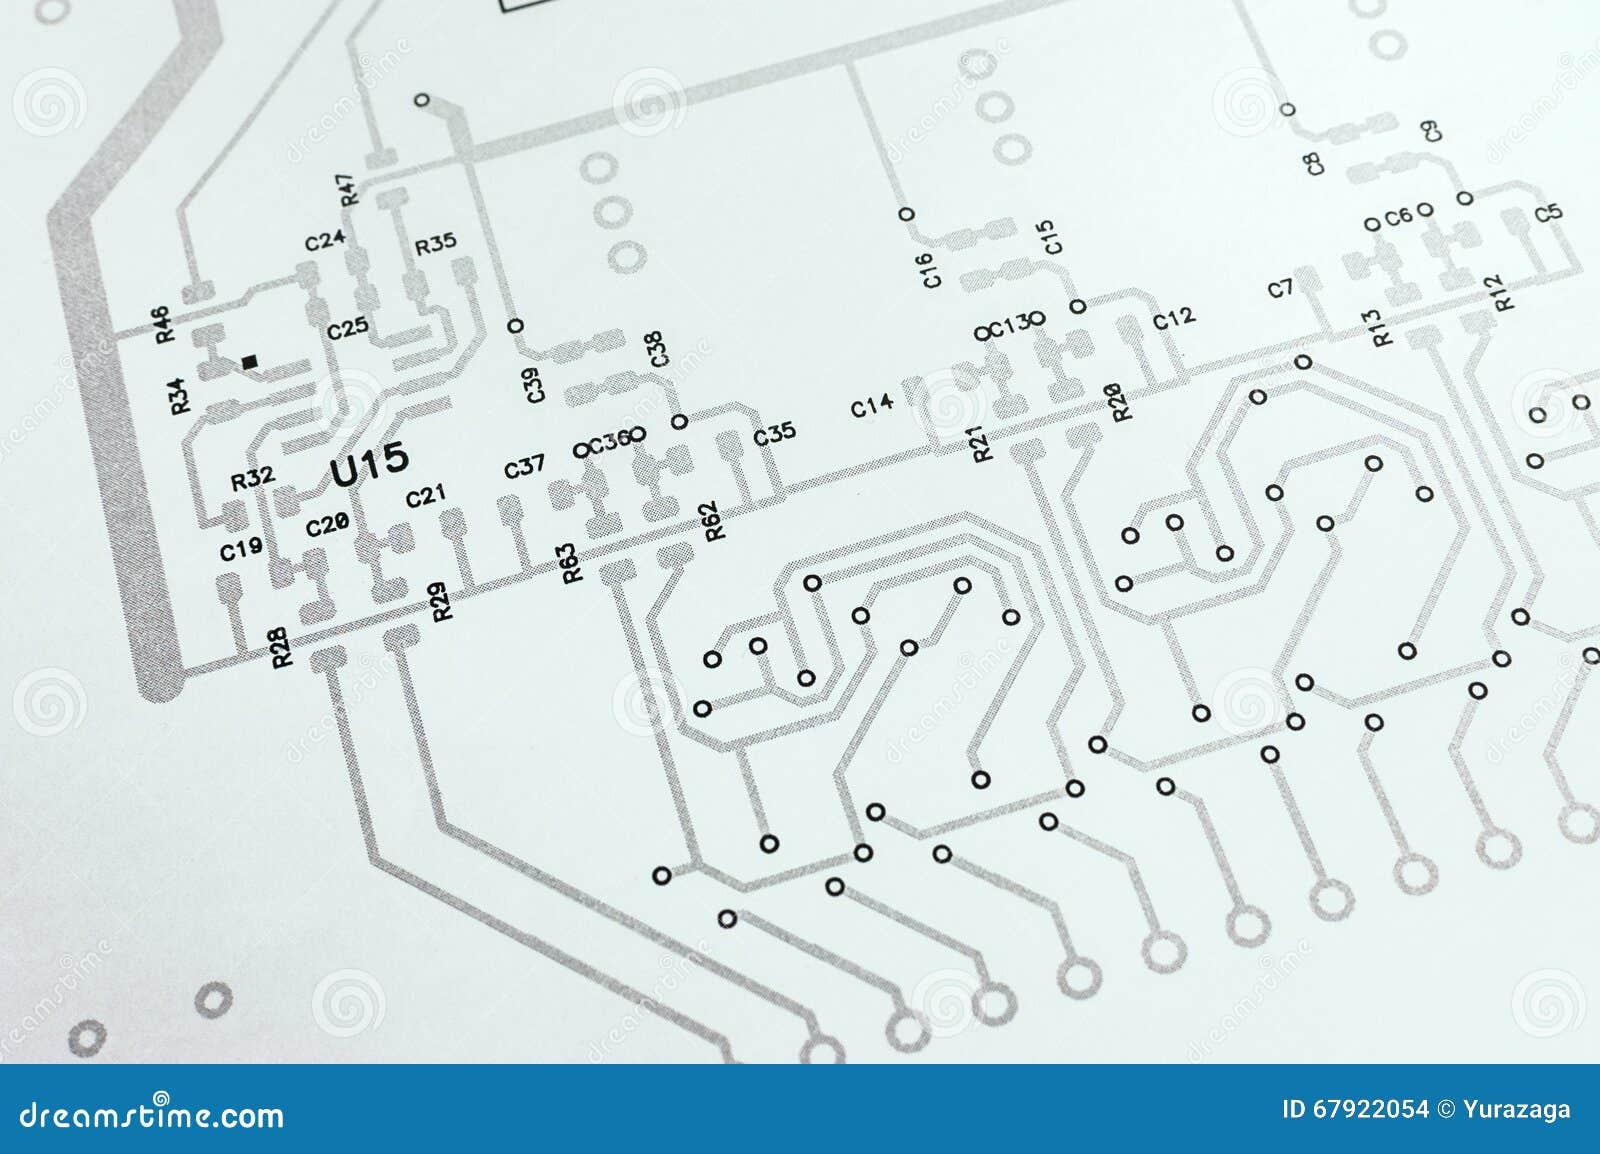 Electronic Circuit Board Schematic Stock Illustration - Illustration ...